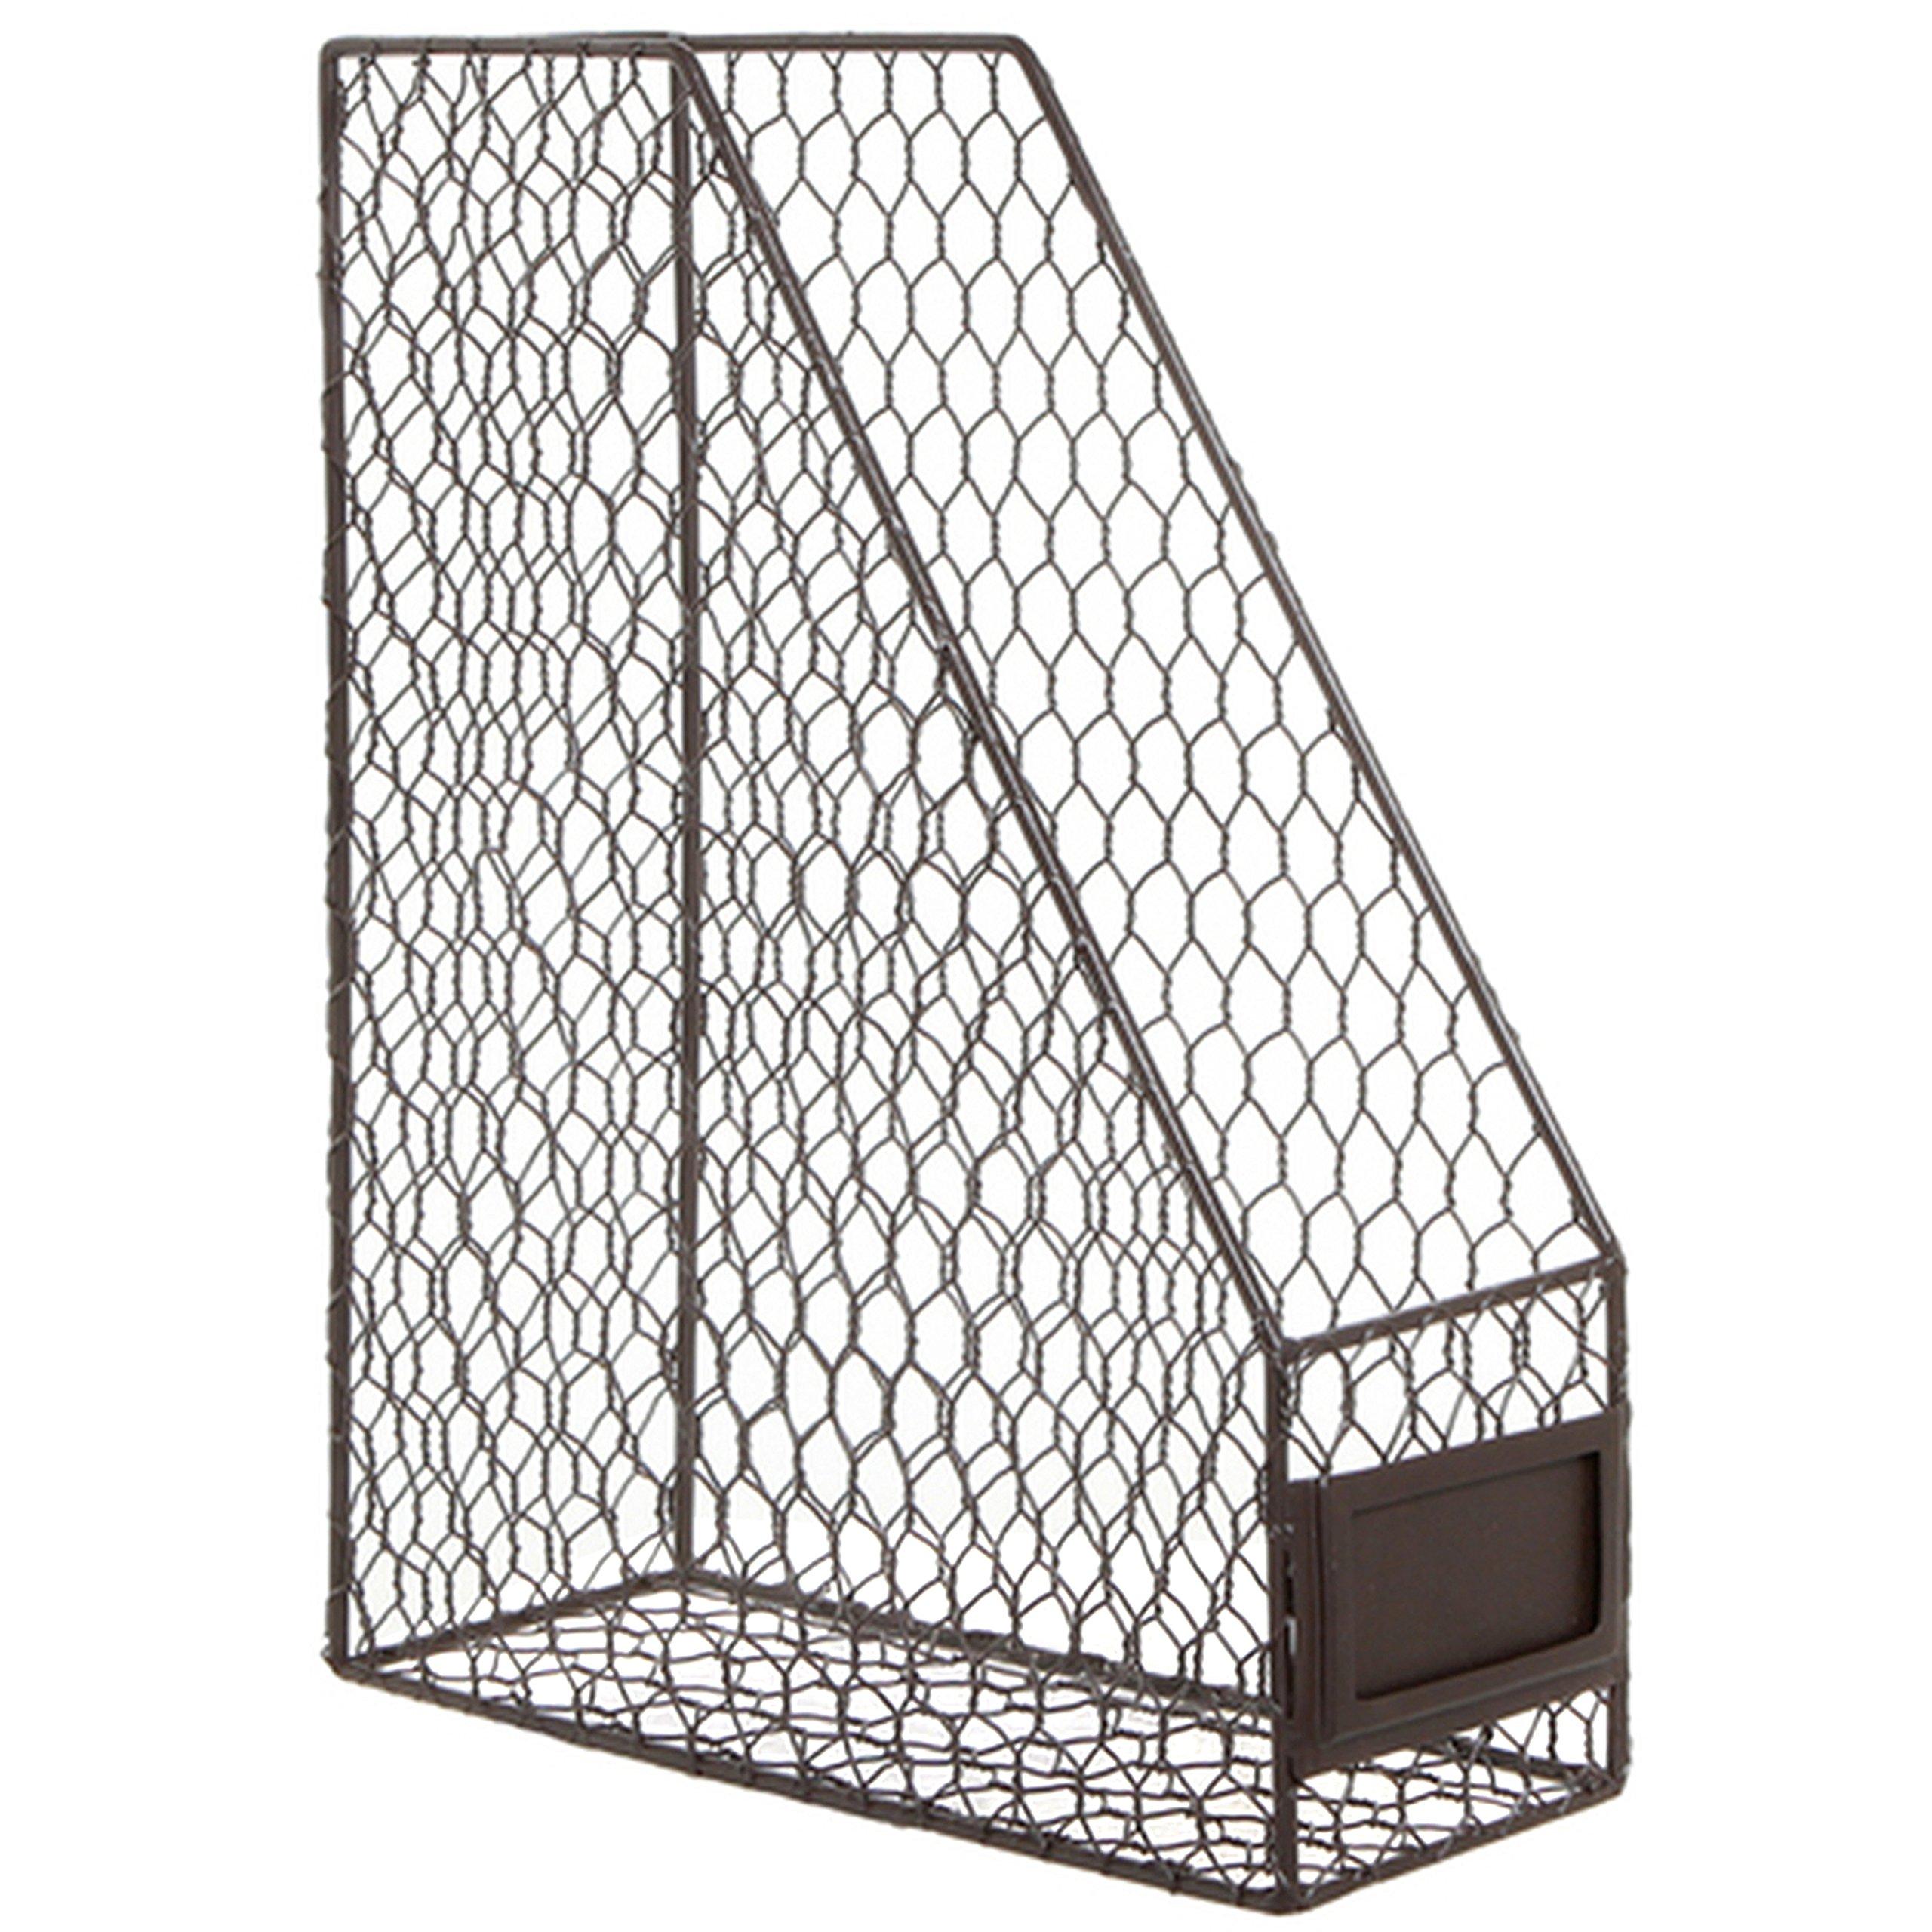 Rustic Chicken Wire Magazine, Office Document, File Holder Shelf Organizer Basket w/Chalkboard Label by MyGift